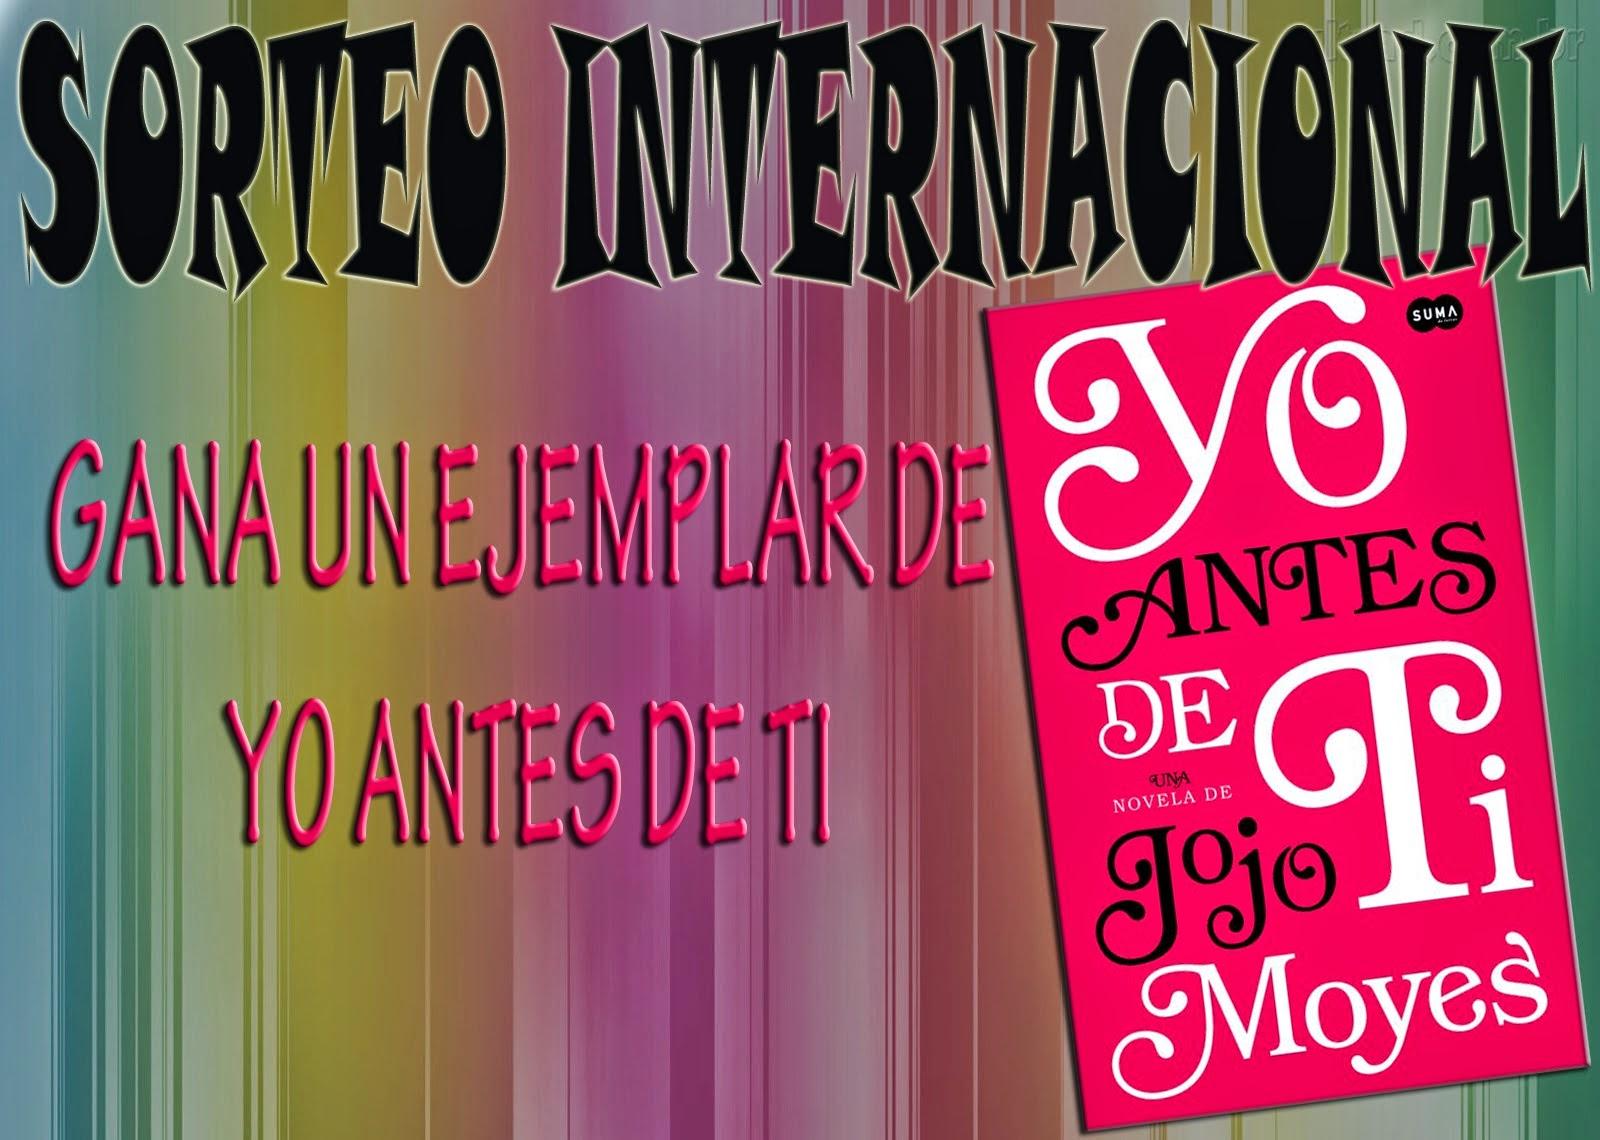 http://elvuelodelagula.blogspot.mx/2014/08/sorteo-internacional-yo-antes-de-ti.html